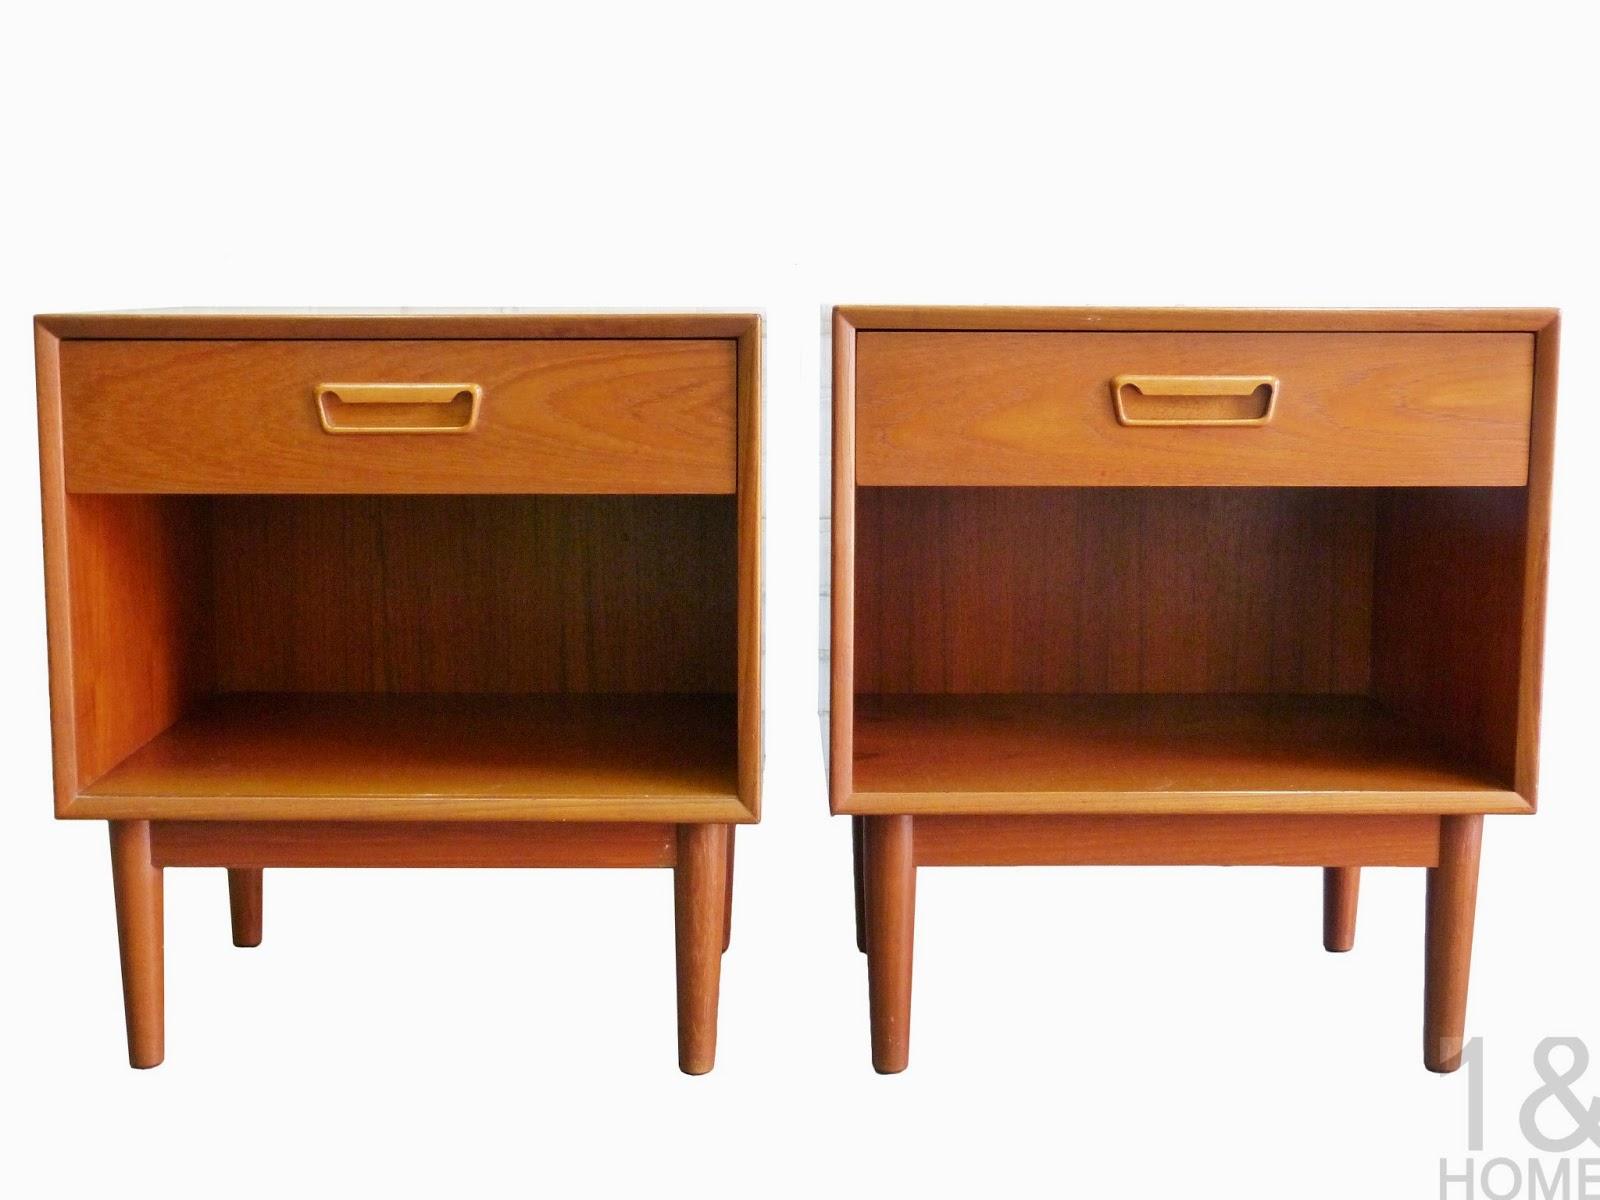 Westnofa Danish Modern Mid-Century pair of Nightstands